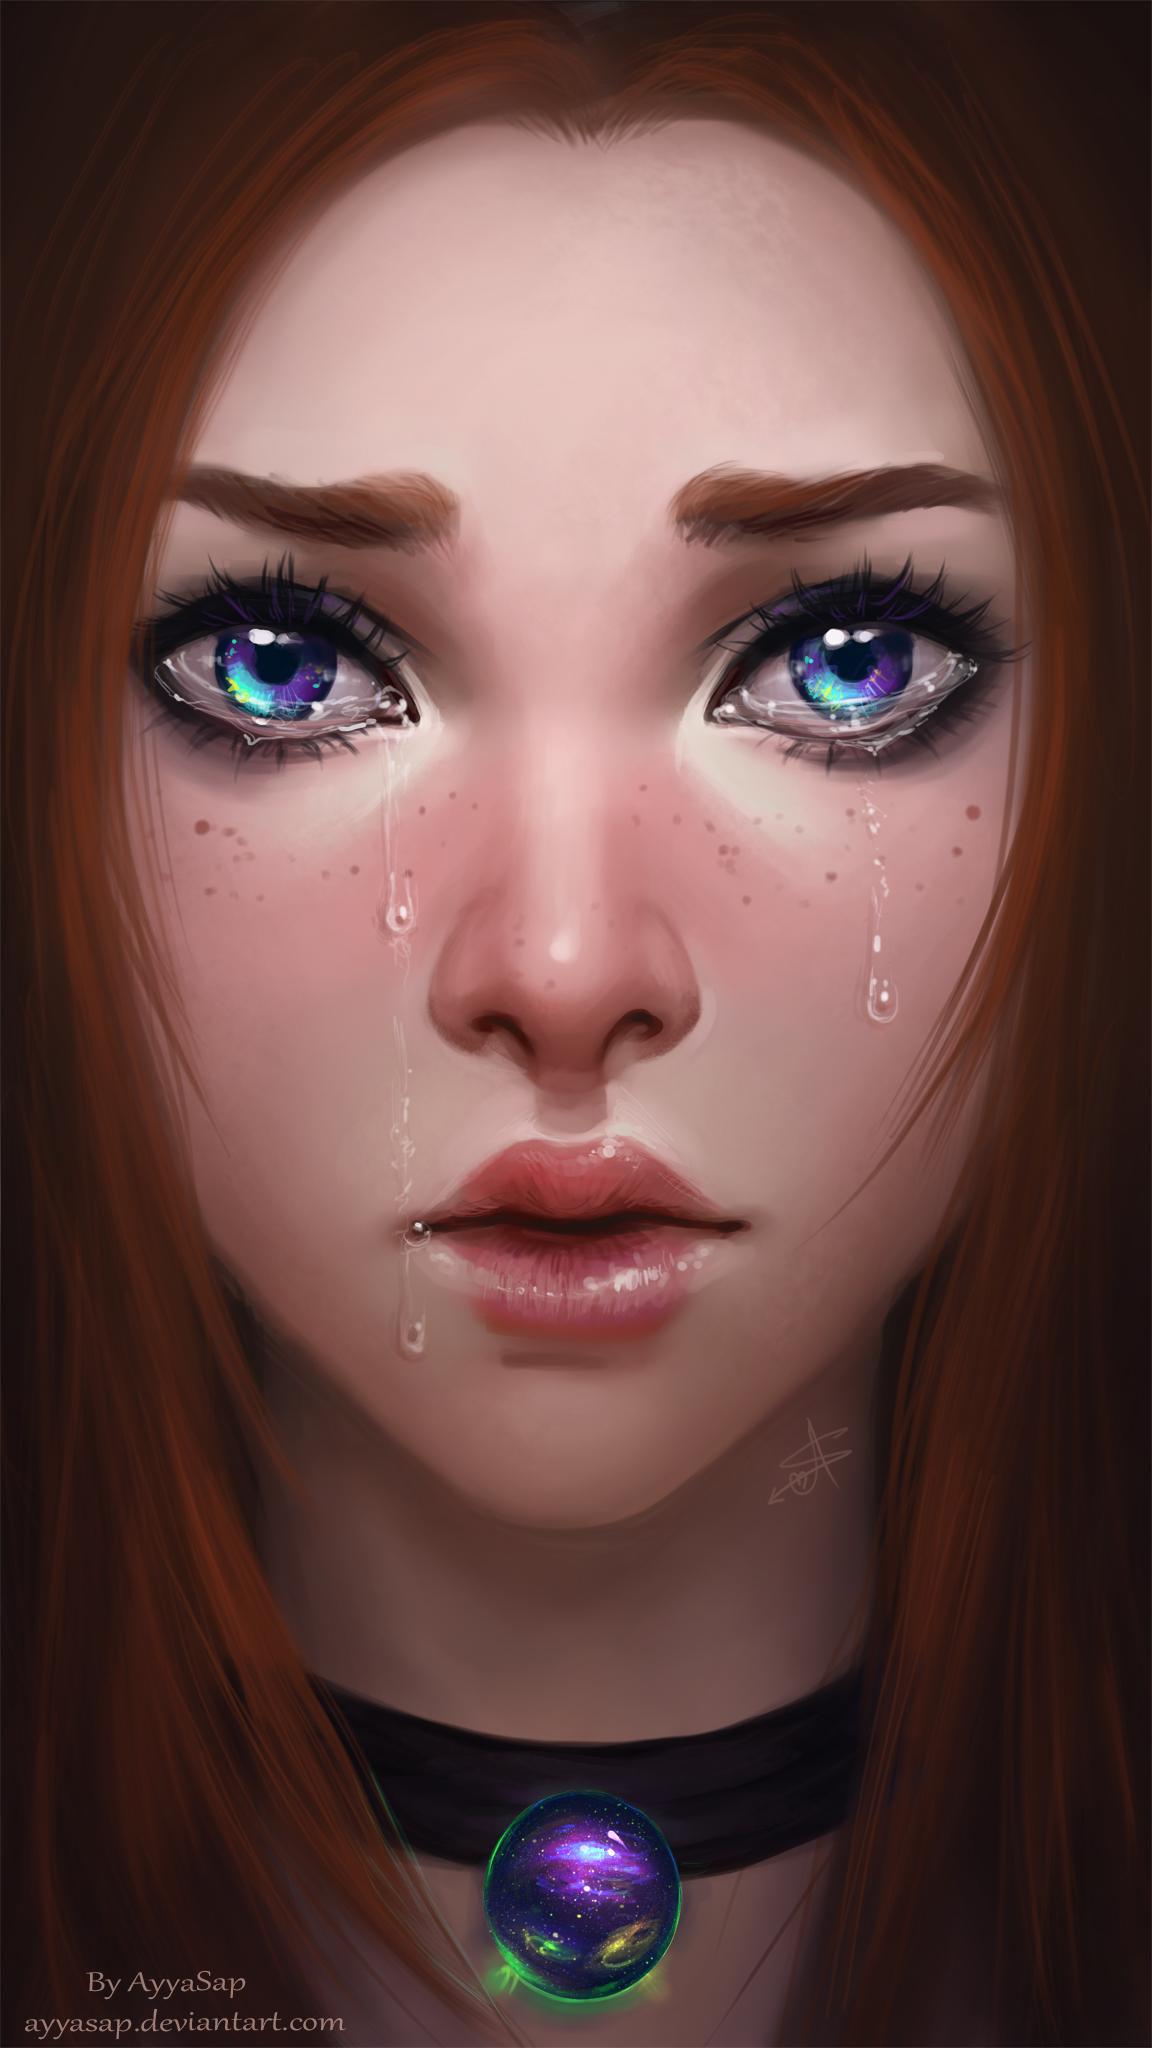 weeping eyes by AyyaSAP